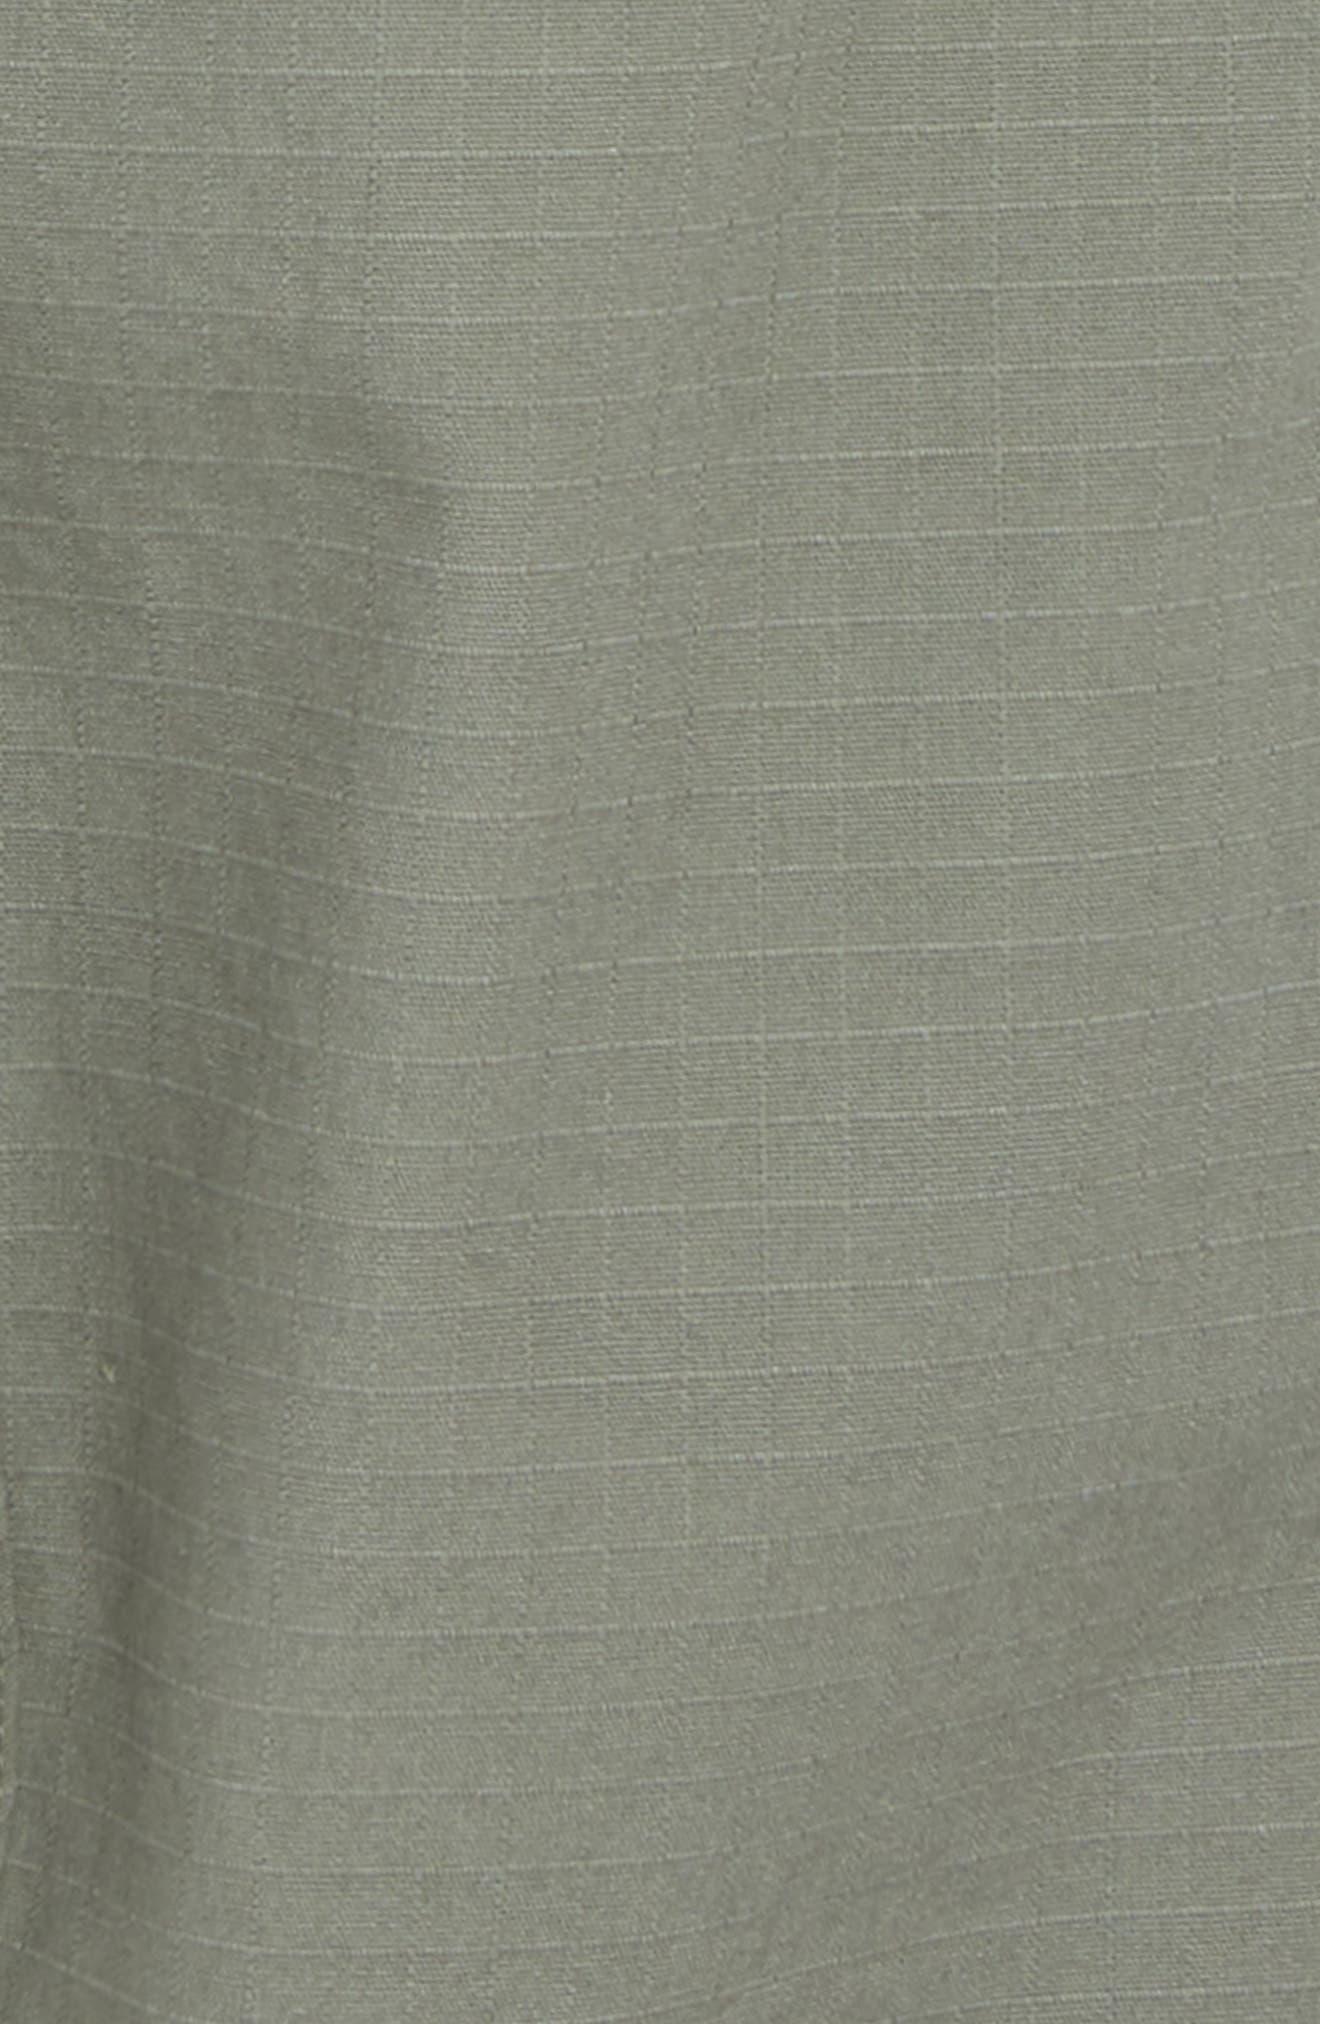 Ripstop Shorts,                             Alternate thumbnail 2, color,                             Green Agave